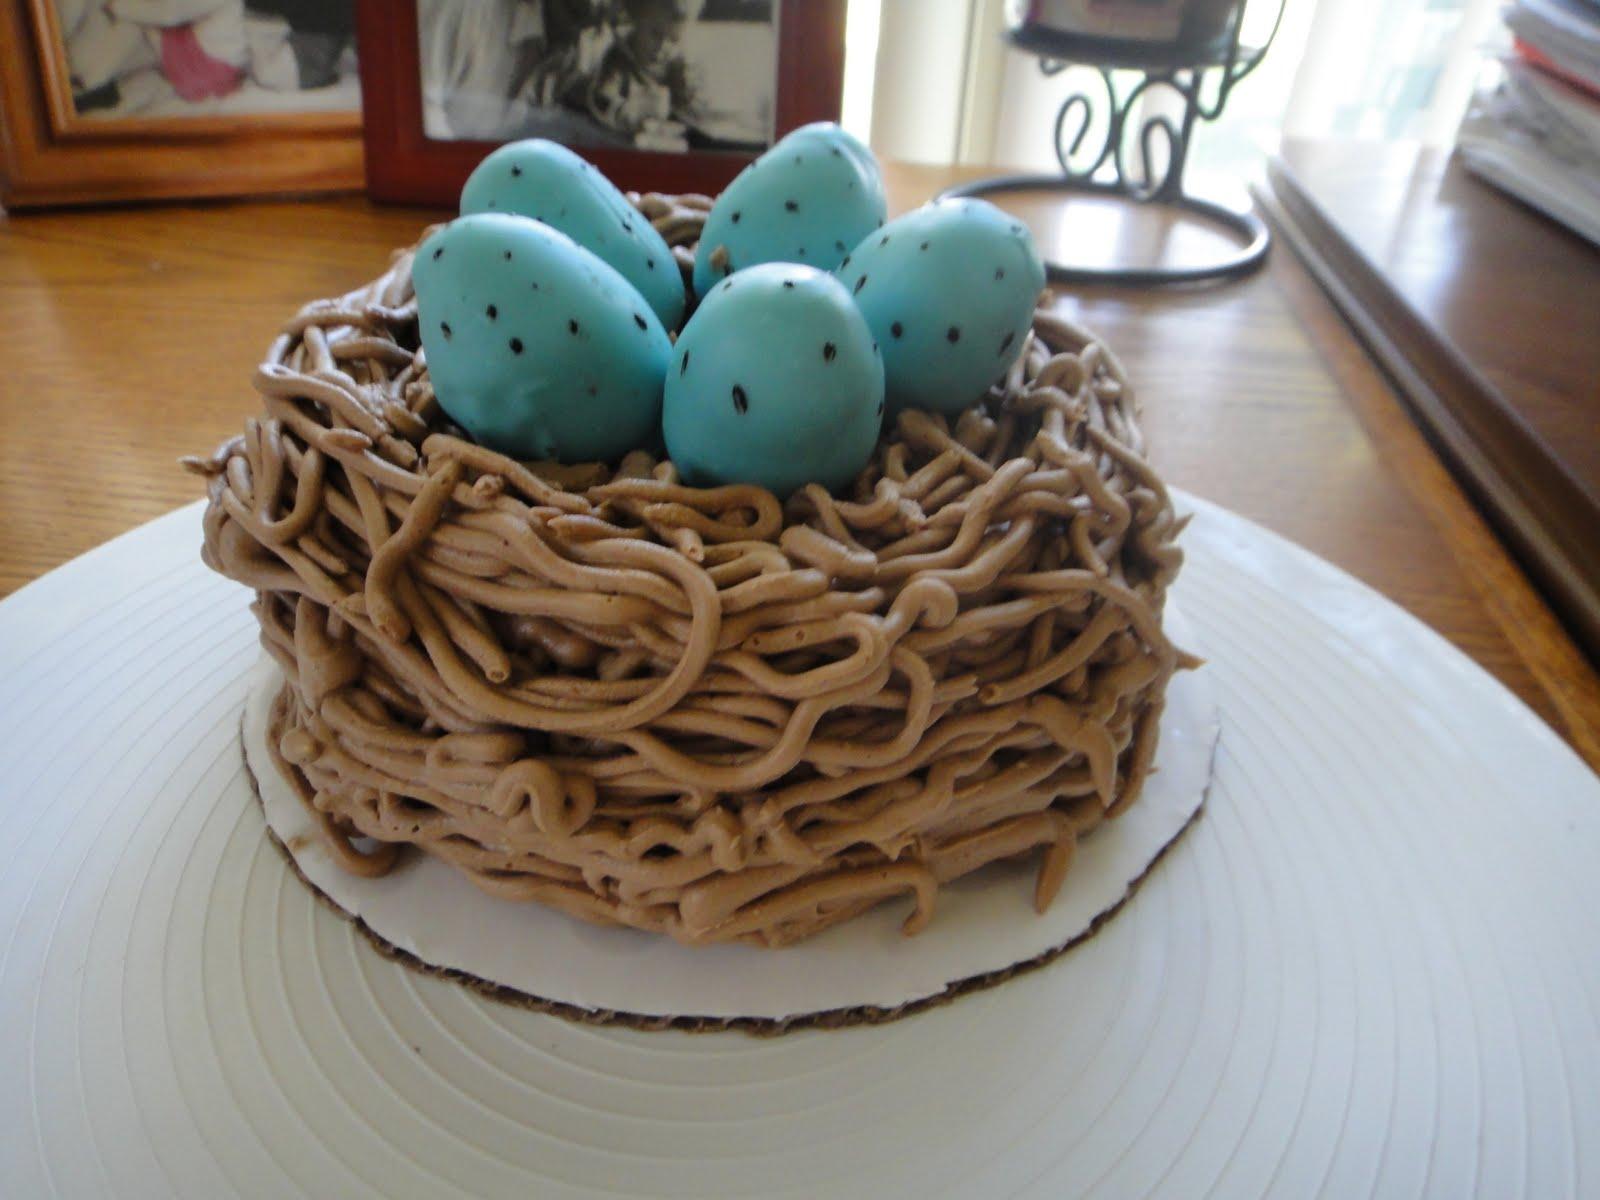 Kims Cakes and Crumbs: Birds Nest Cake